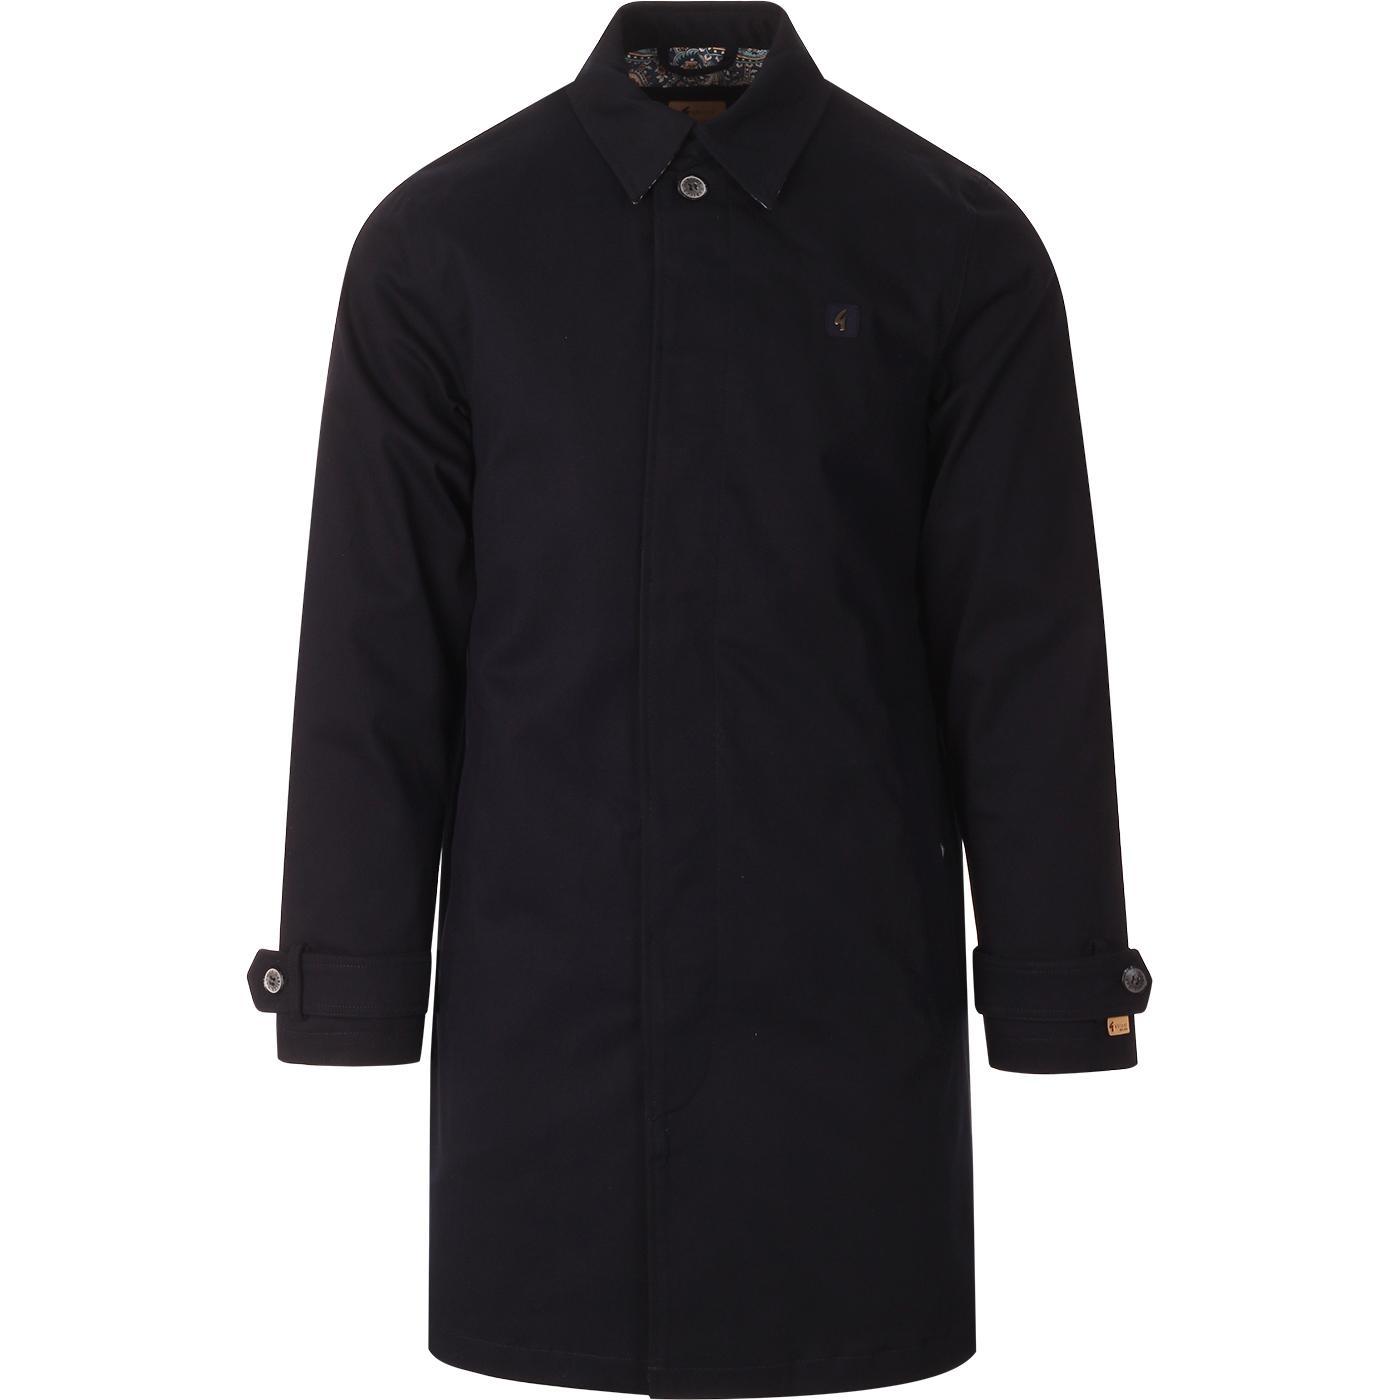 Houghton GABICCI VINTAGE 60s Mod Mac Jacket (N)